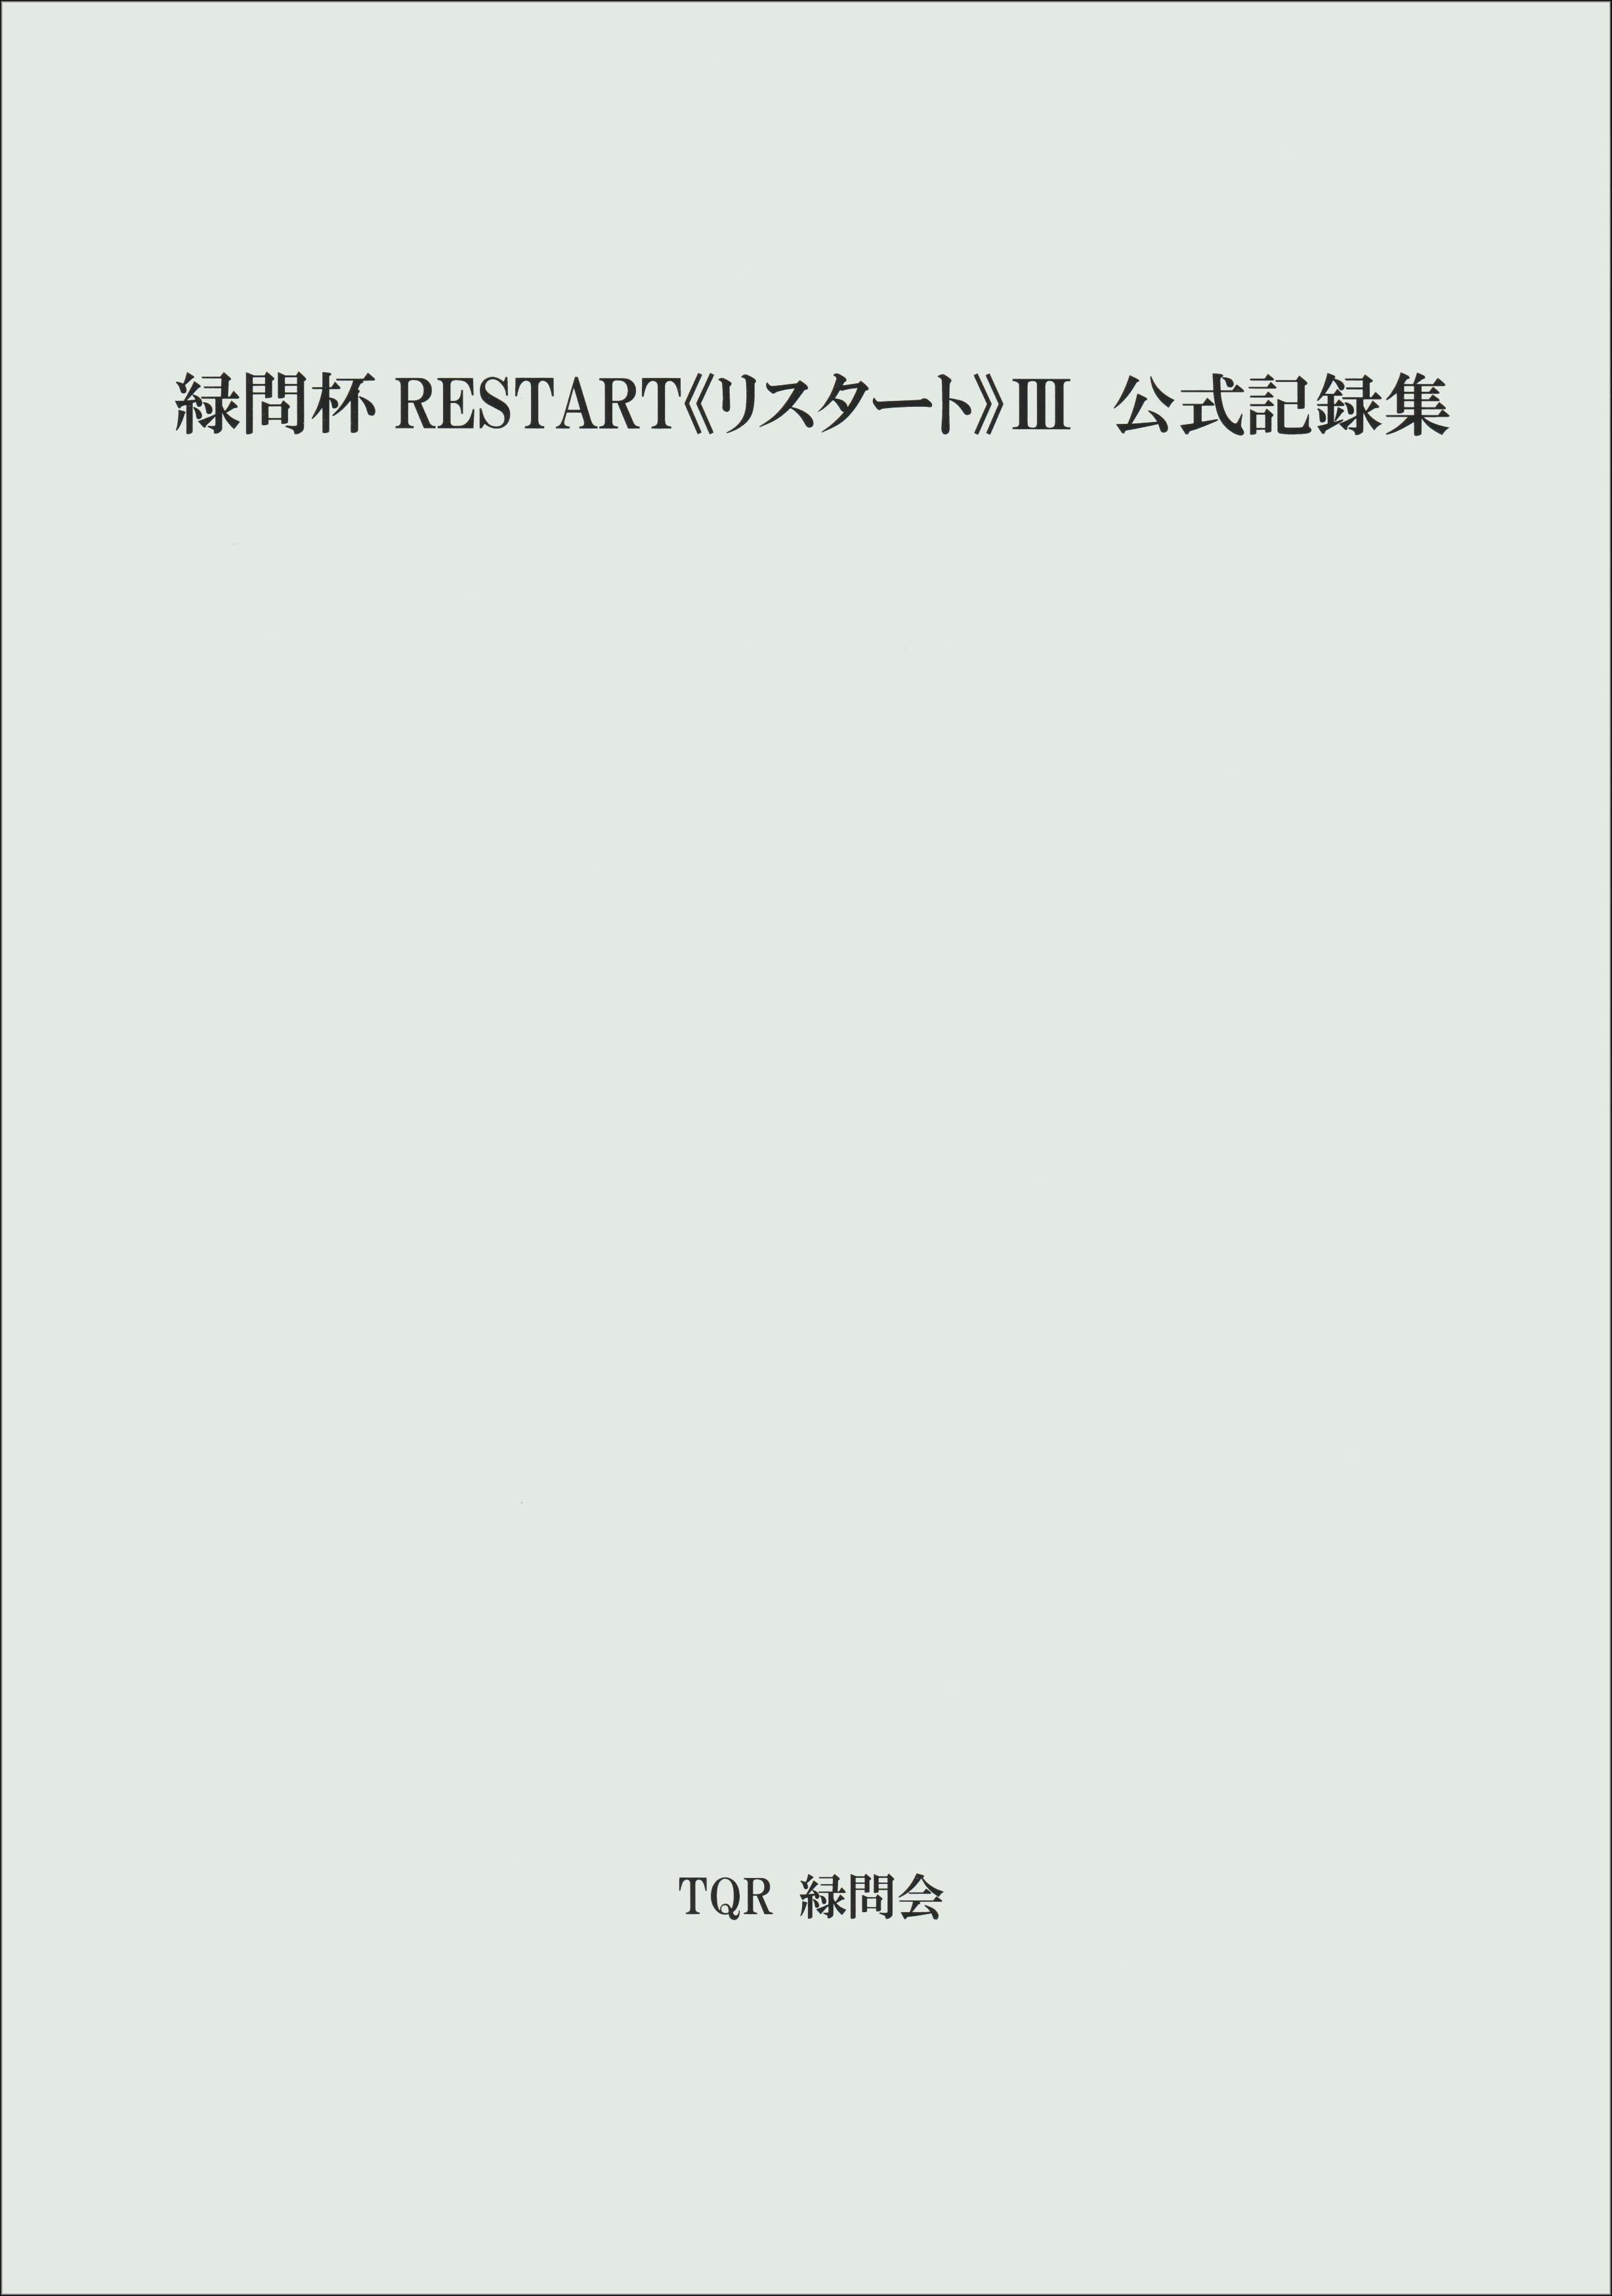 C11981925